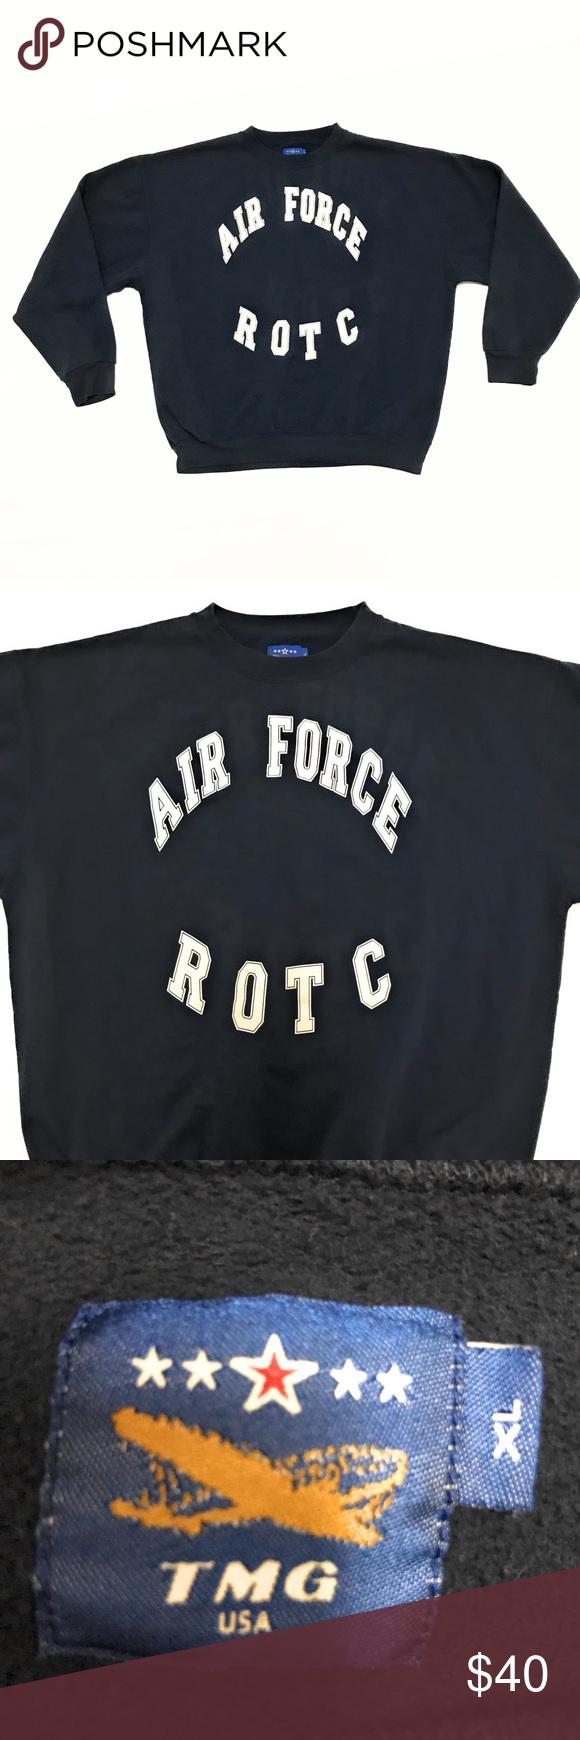 Vintage 90s Military Air Force Jrotc Sweatshirt Vintage 90s Military Air Force Jrotc Sweatshirt Men S Size Xl Arm Sweatshirts Sweatshirt Shirt Mens Sweatshirts [ 1740 x 580 Pixel ]